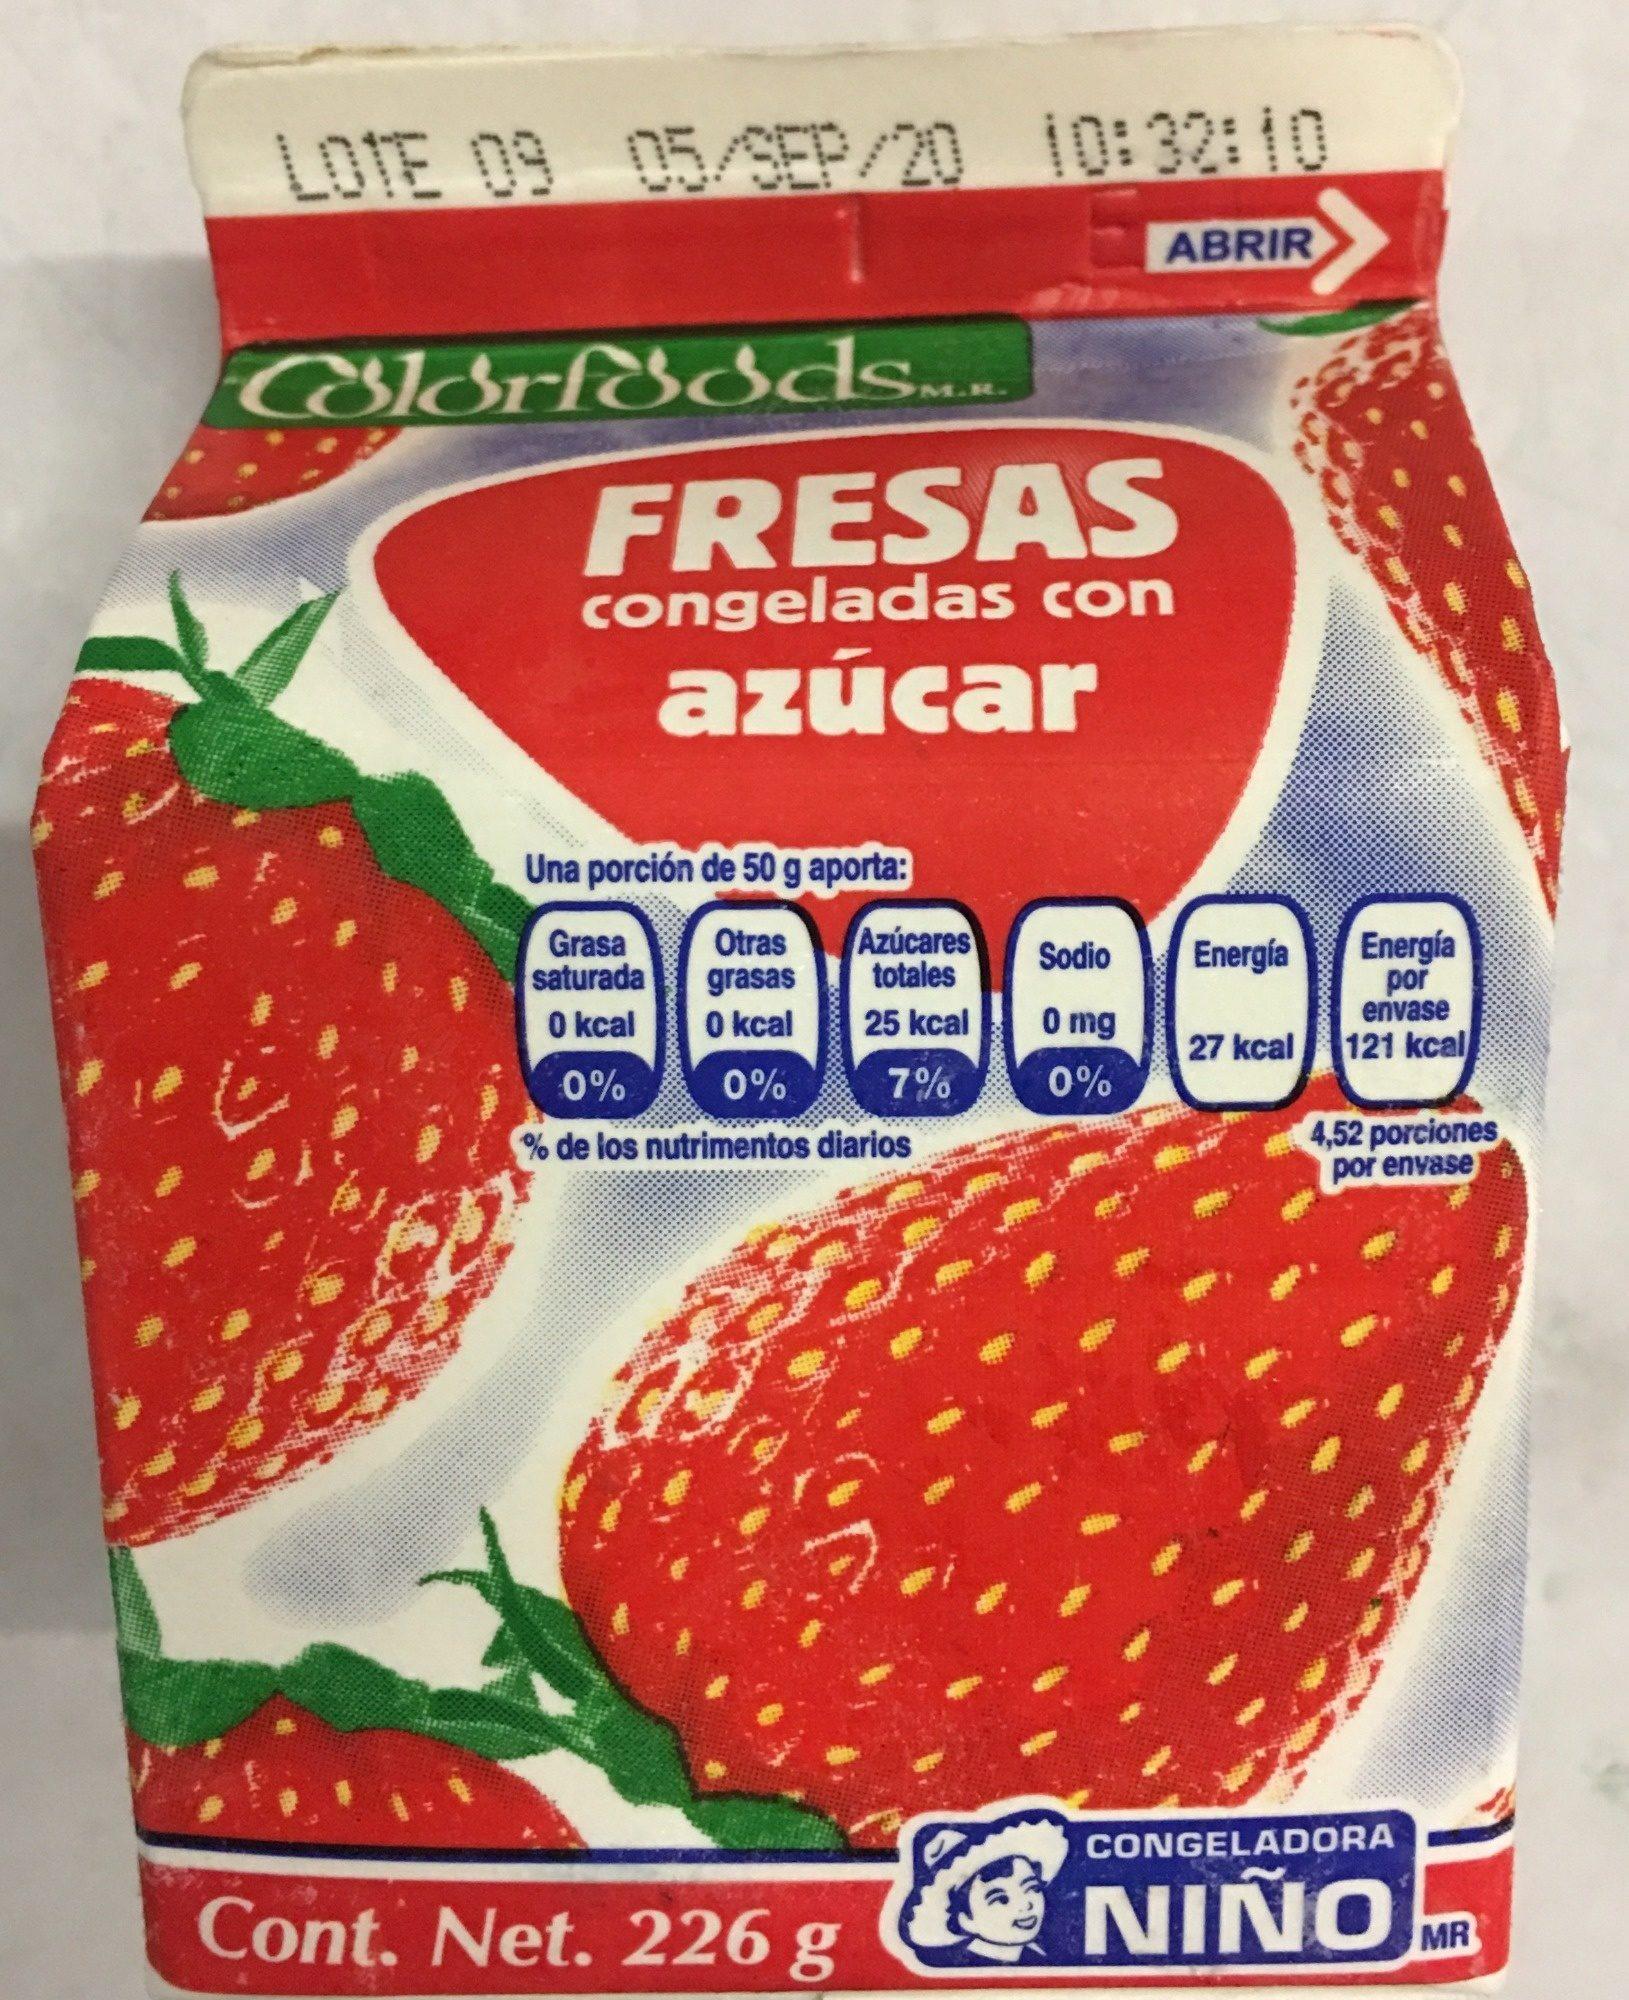 Fresas congelada con azucar - Produit - es